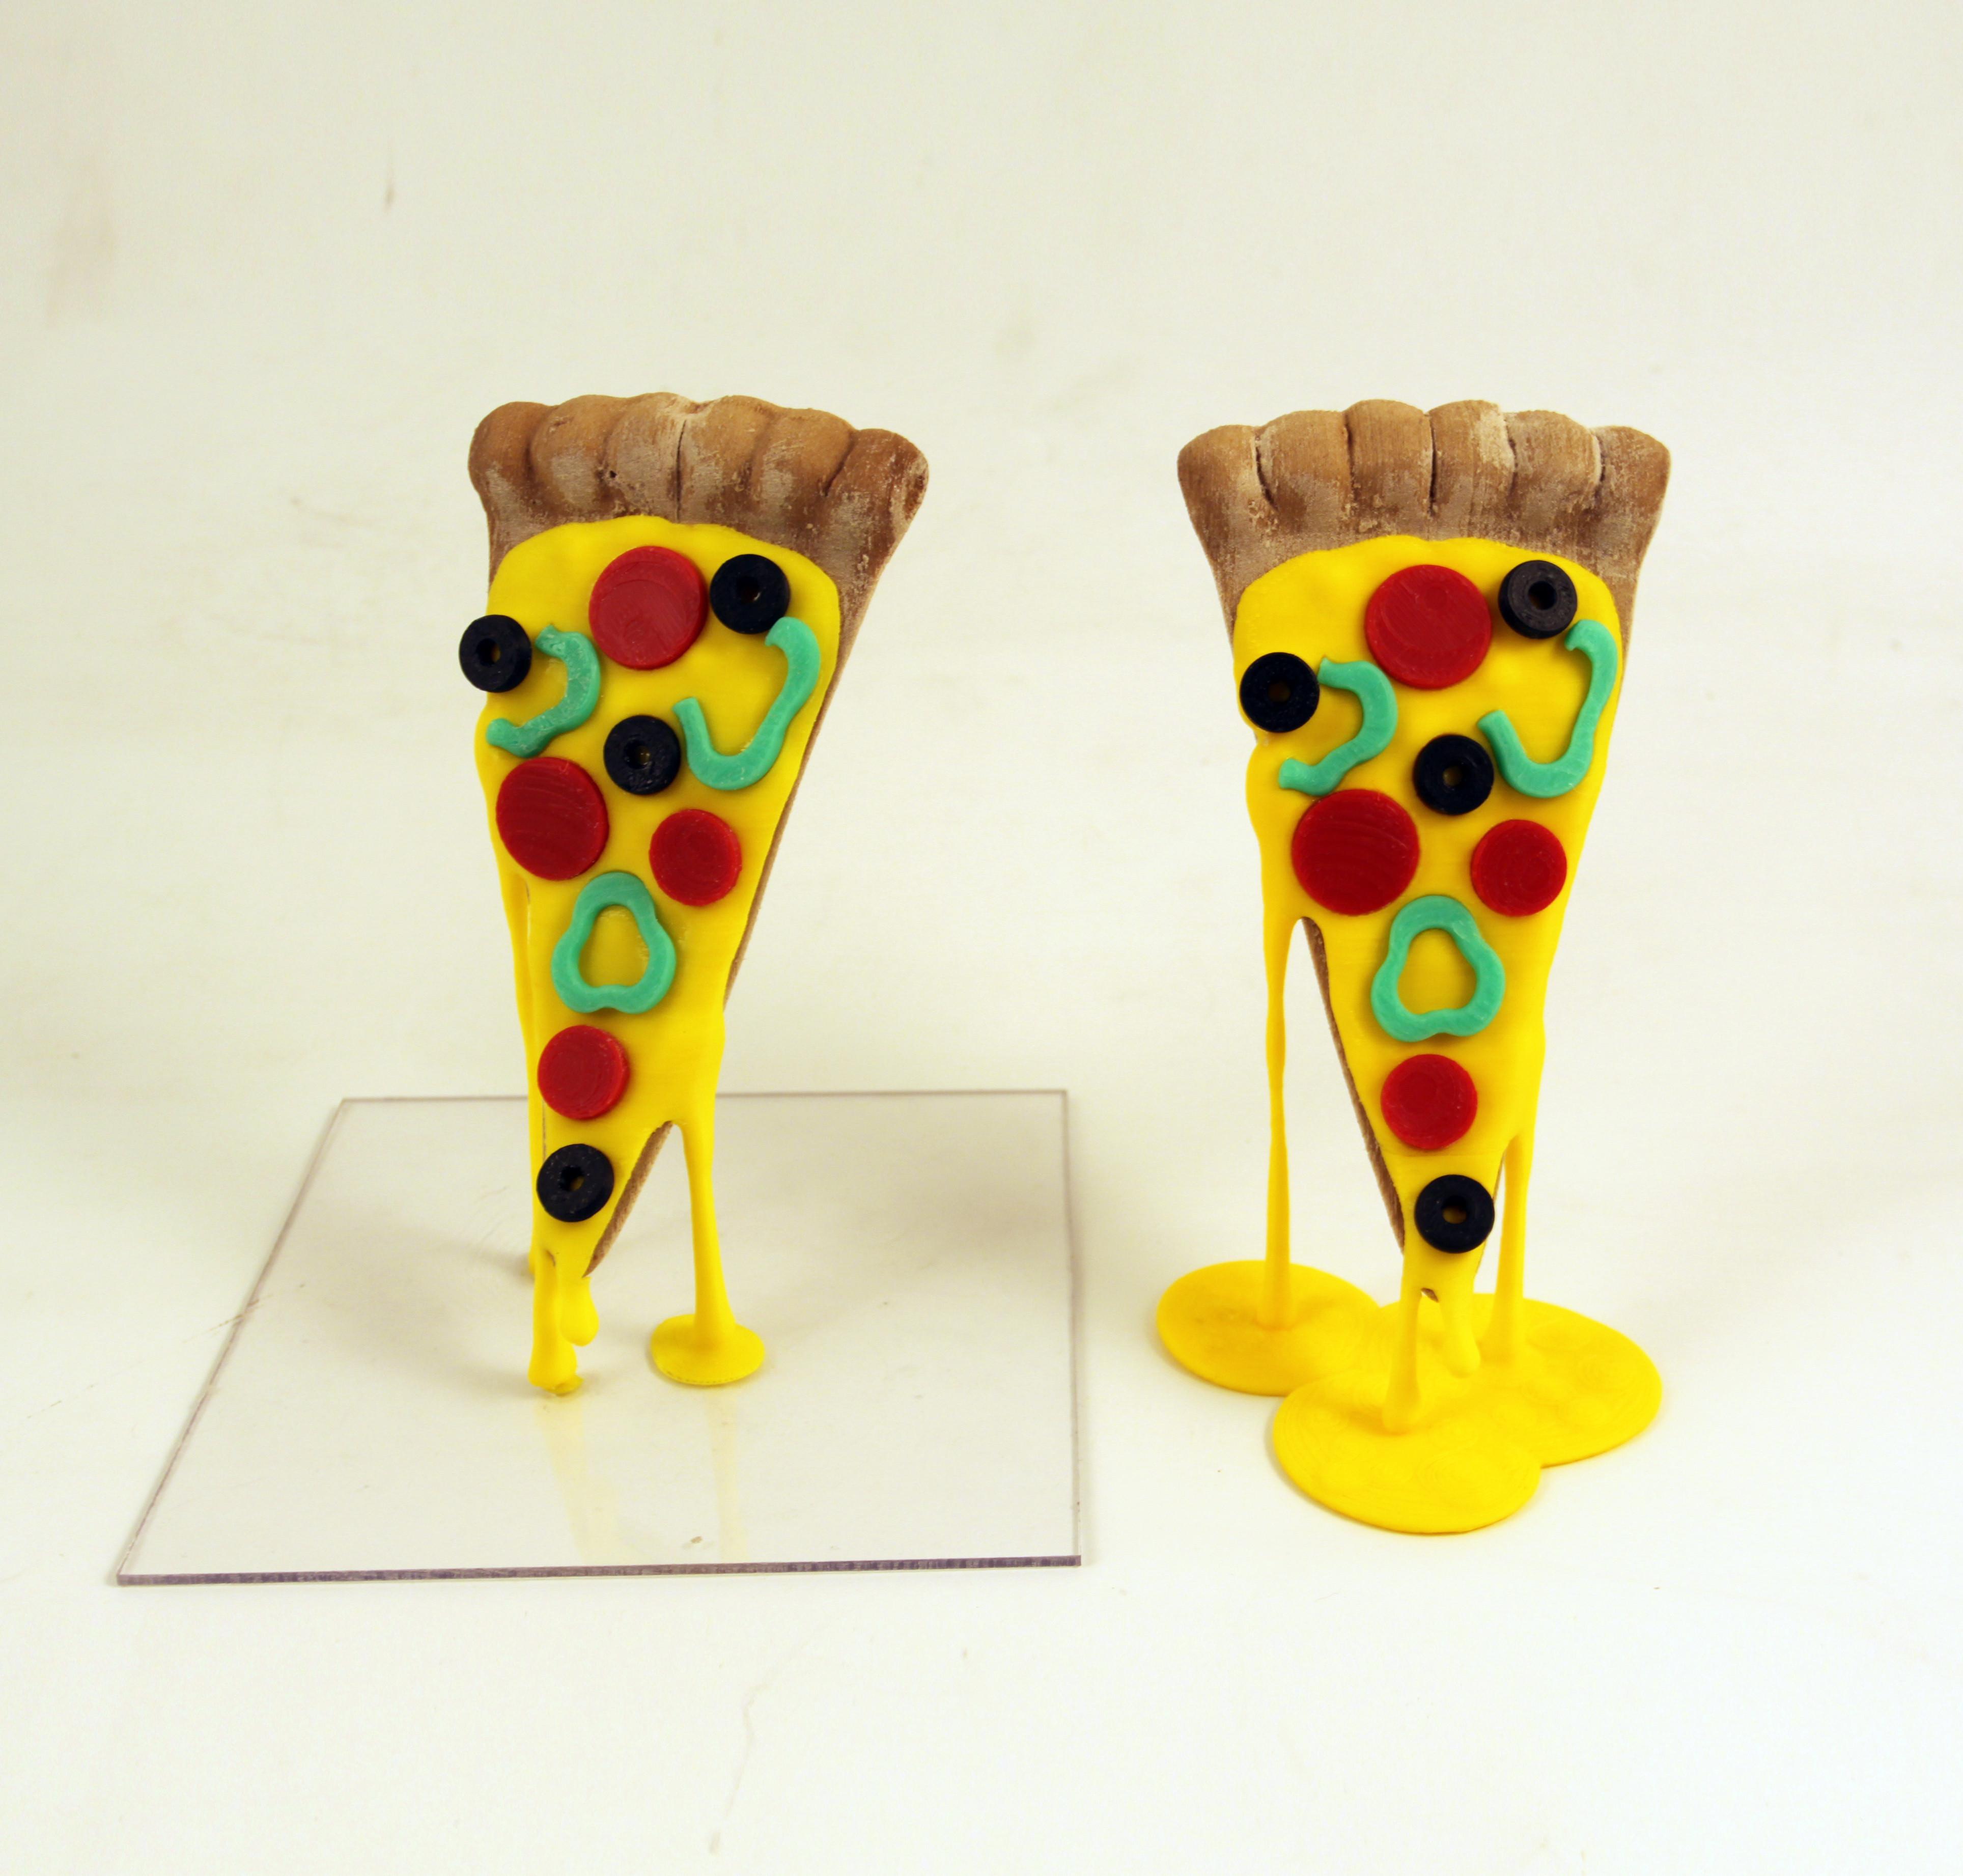 3D Printed Pizza Slice